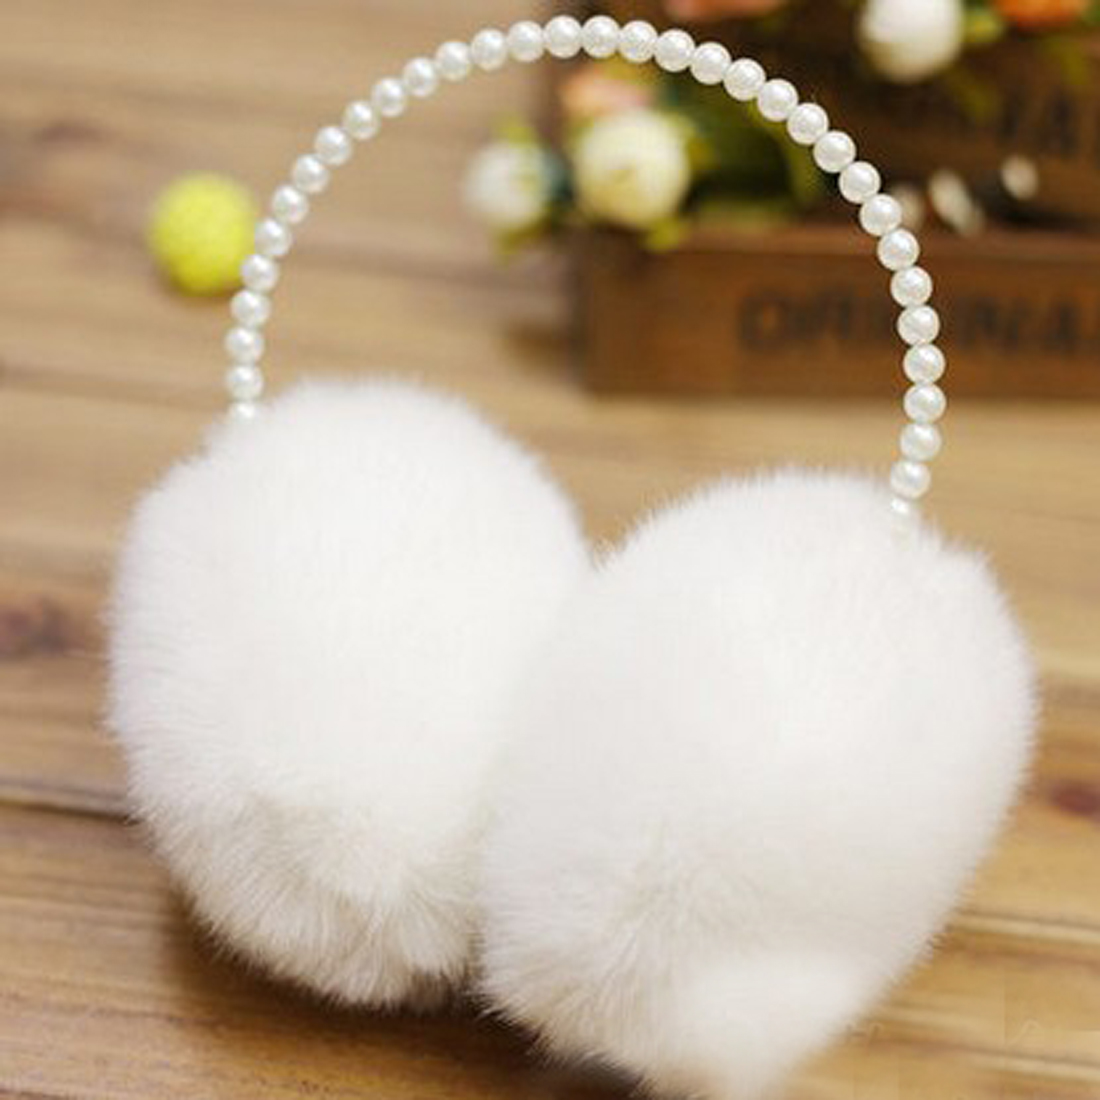 Winter Pearl Imitation Rabbit Fur 2018 Women Earmuffs Ear Warmer Soft Lady Keep Warm White Coffee Beautiful Big Plush Ear Cover